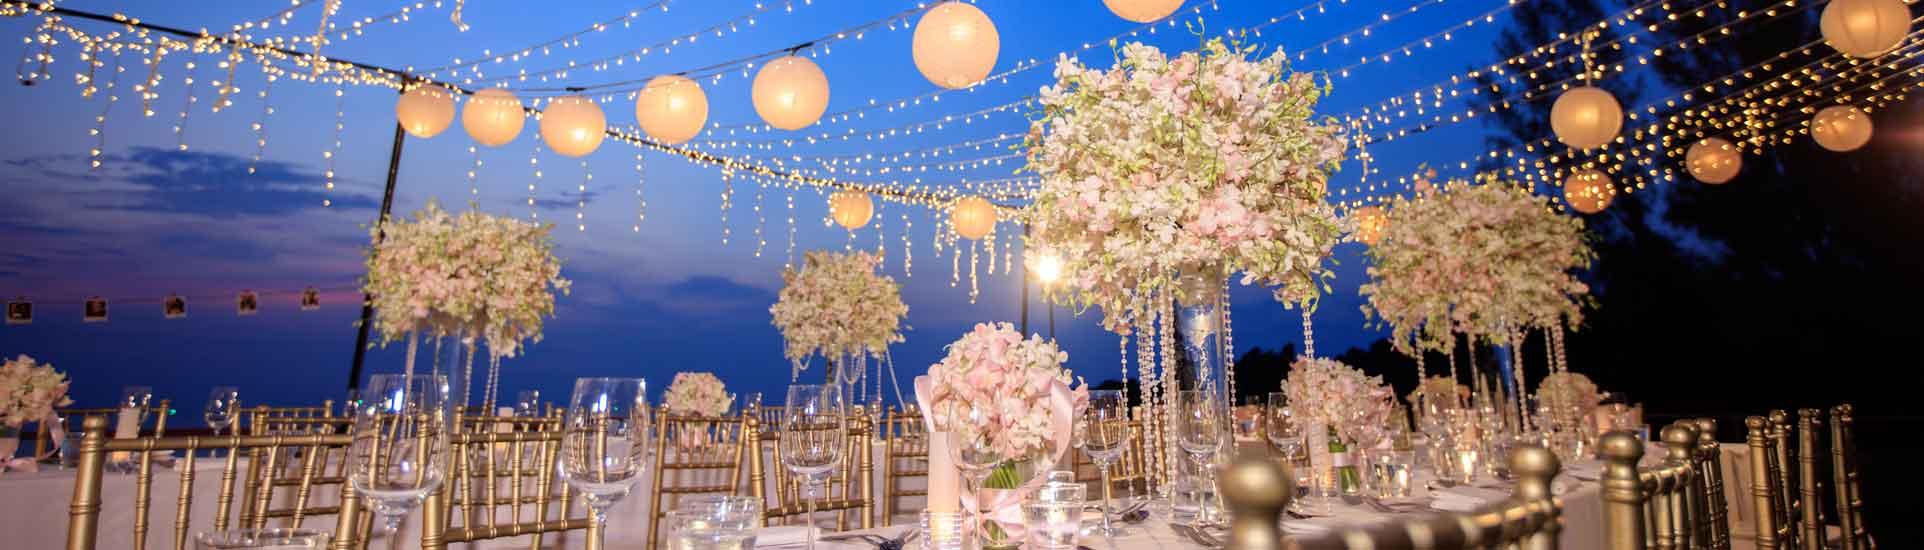 rhodes-wedding-services-fairy-lights-decorative-lighting-header